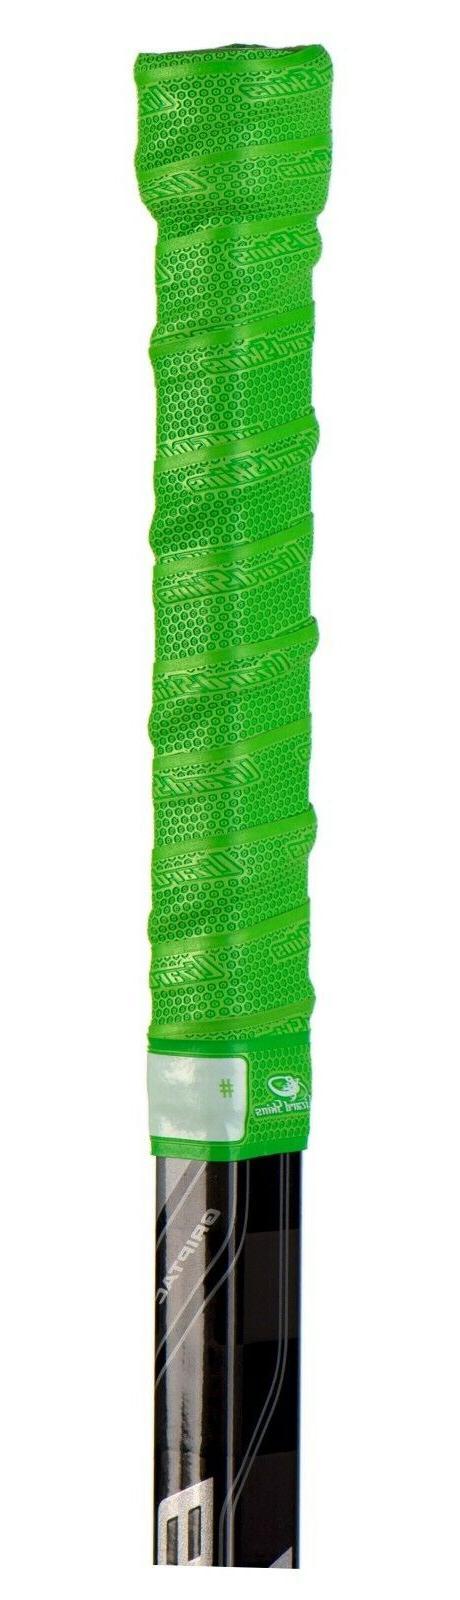 Lizard Skins - Stick